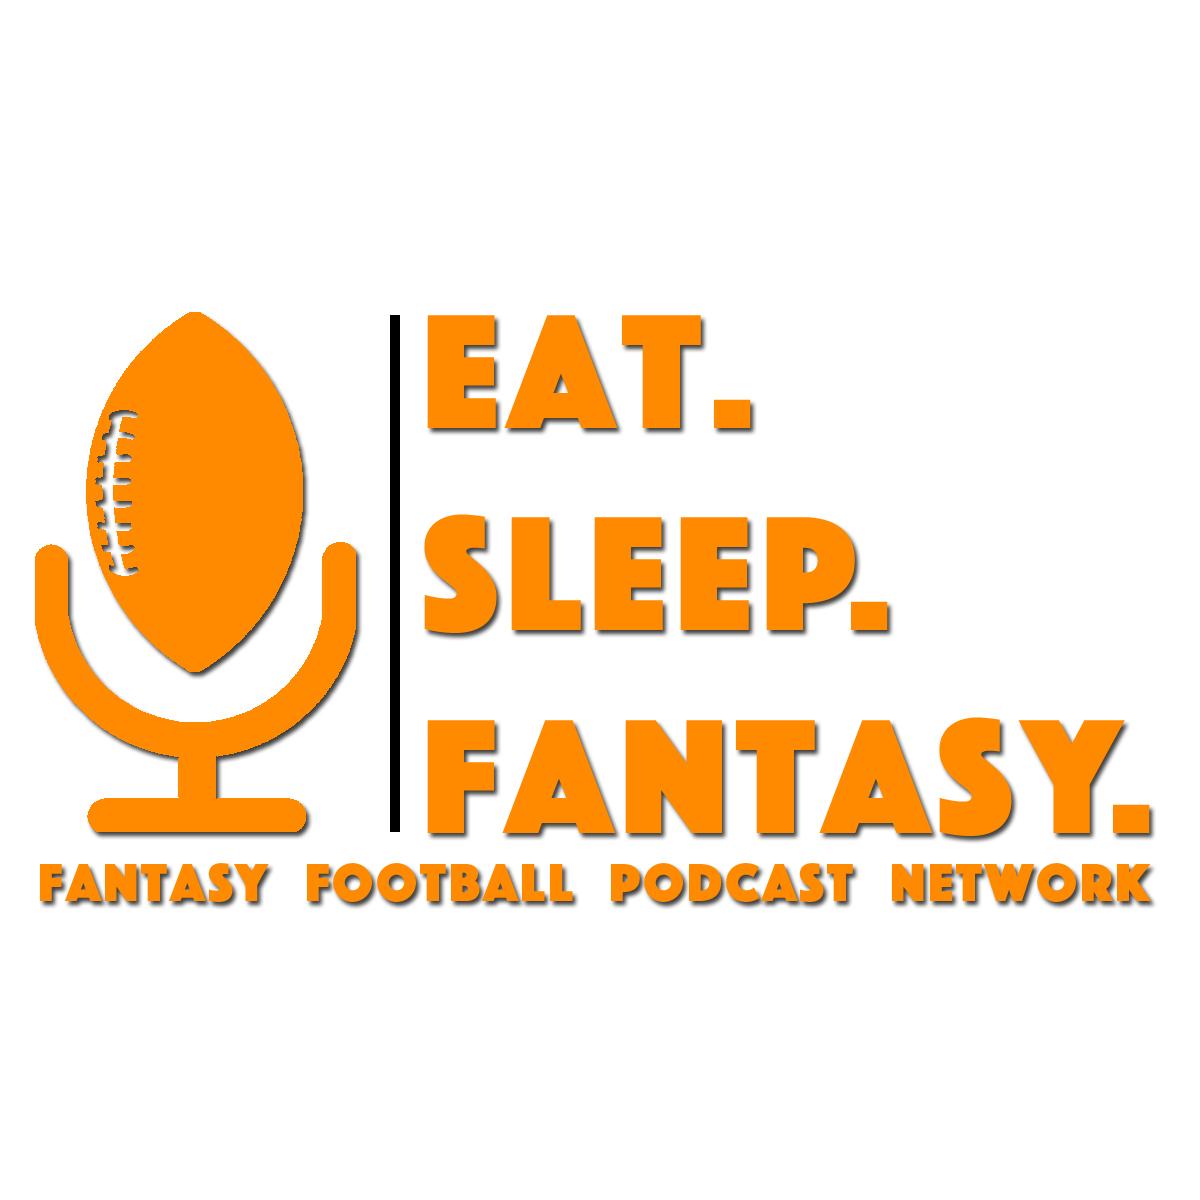 Eat. Sleep. Fantasy.